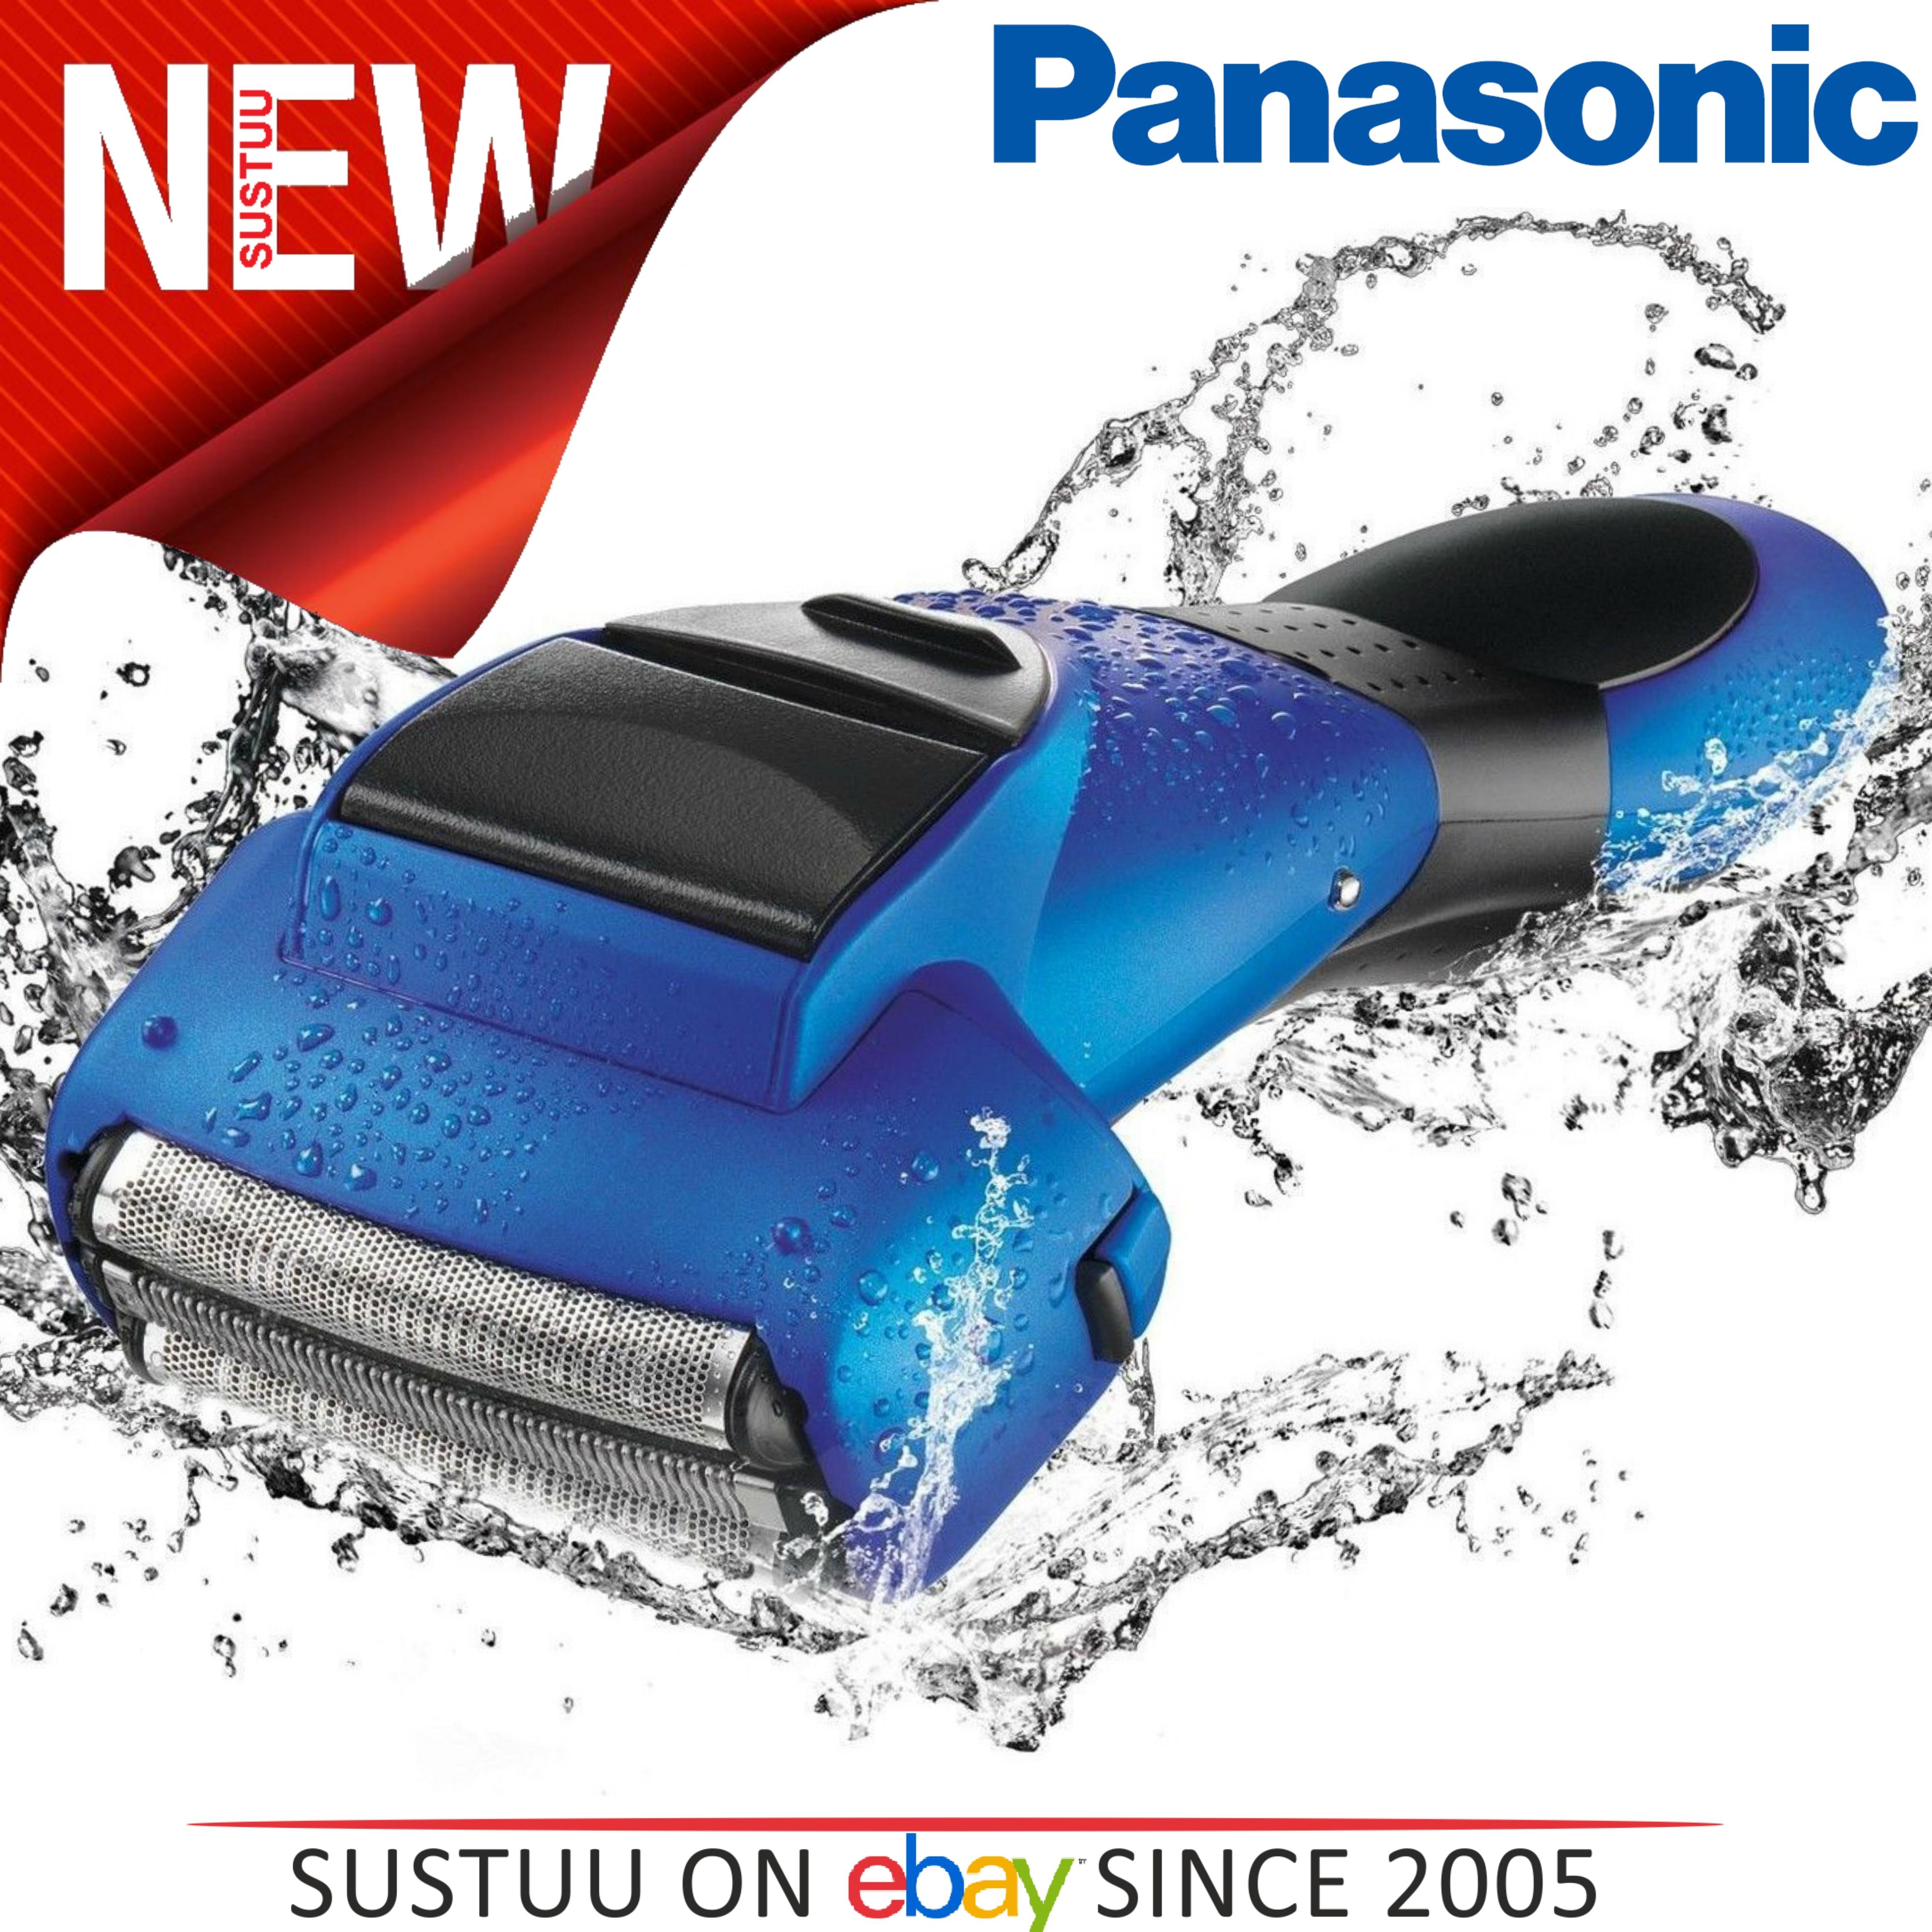 Panasonic Men's 3 Nano Blade Wet & Dry Rechargeable Blue Electric Shaver ESSL41A